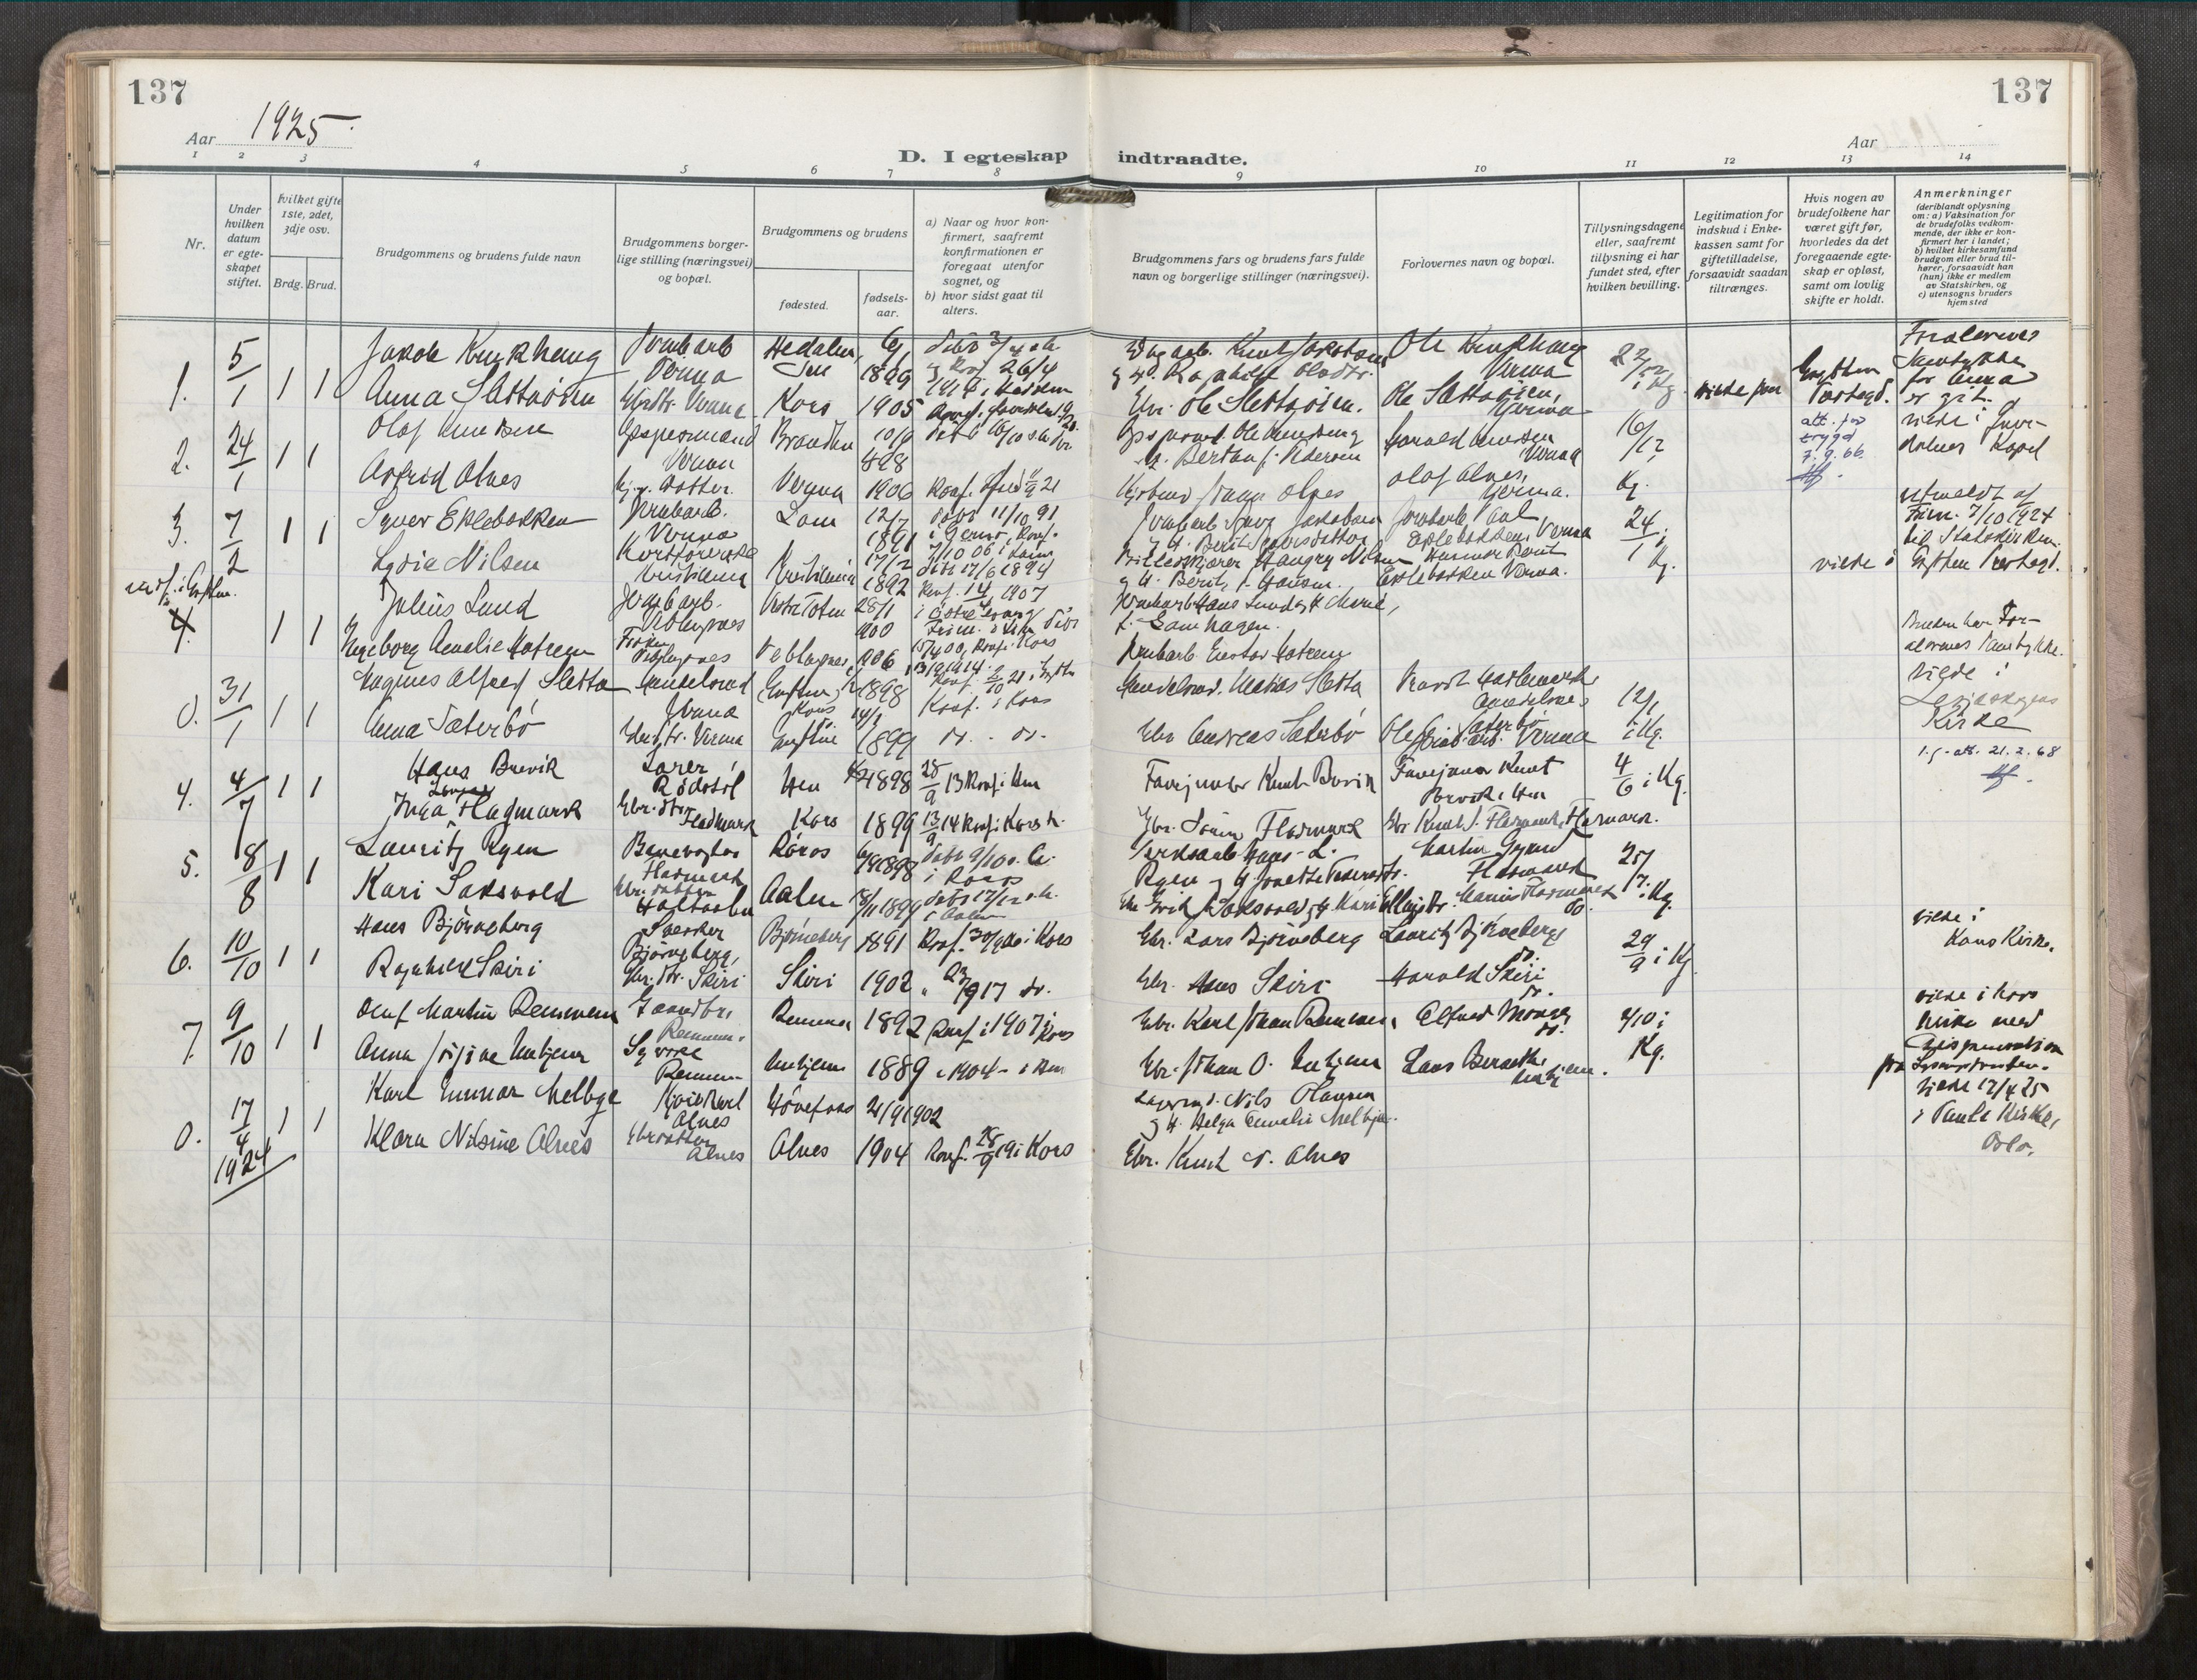 SAT, Grytten sokneprestkontor, Ministerialbok nr. 546A04, 1919-1956, s. 137